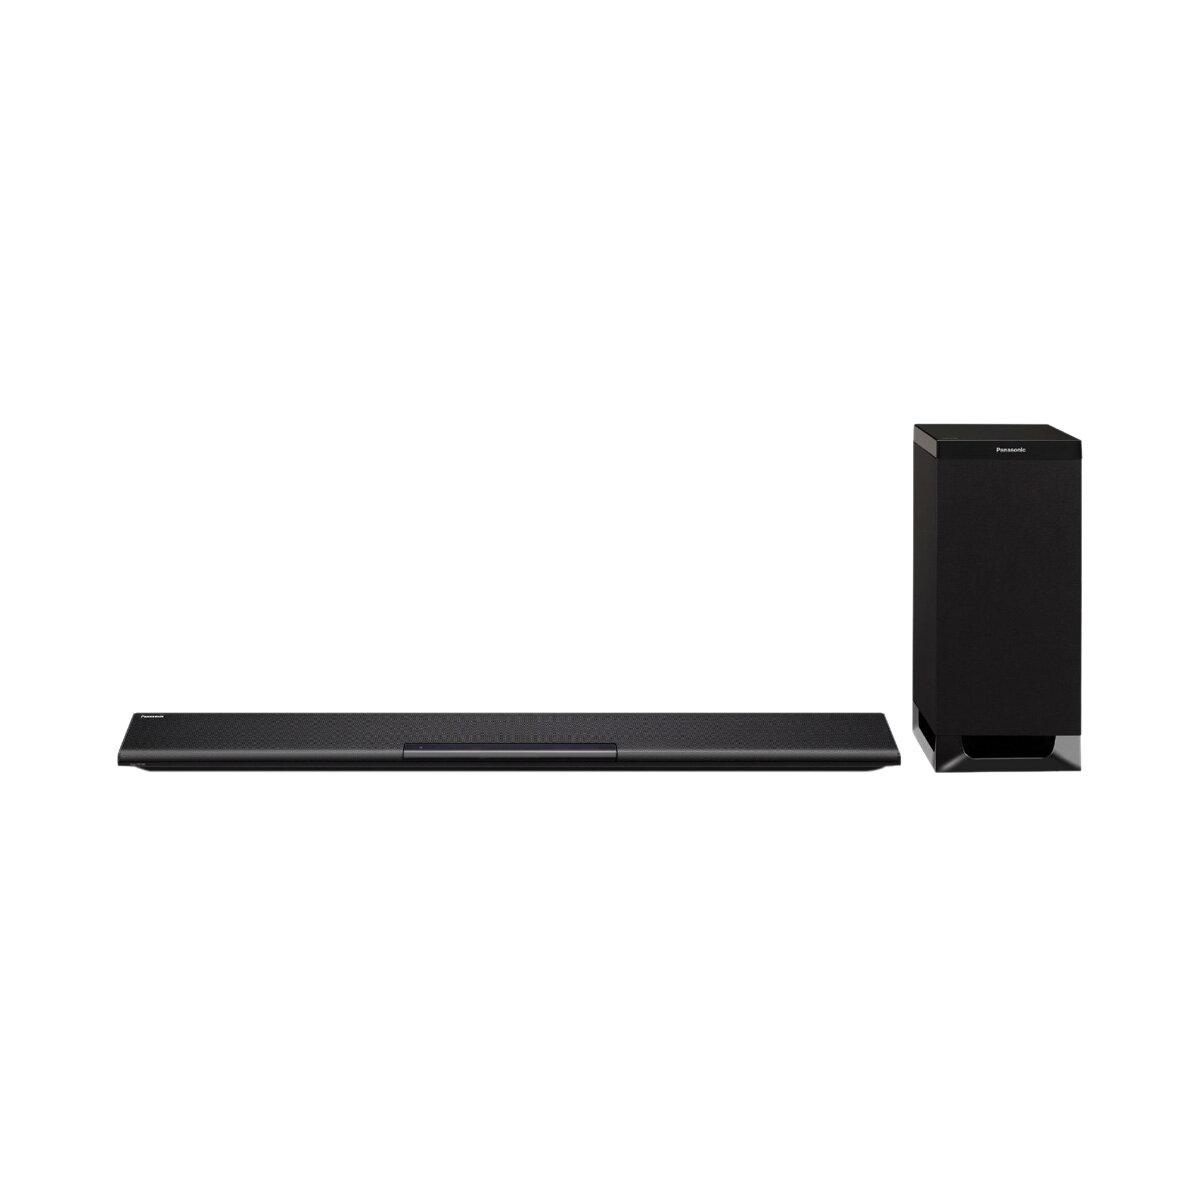 Loa SoundBar PanasonicSC-HTB485GAK